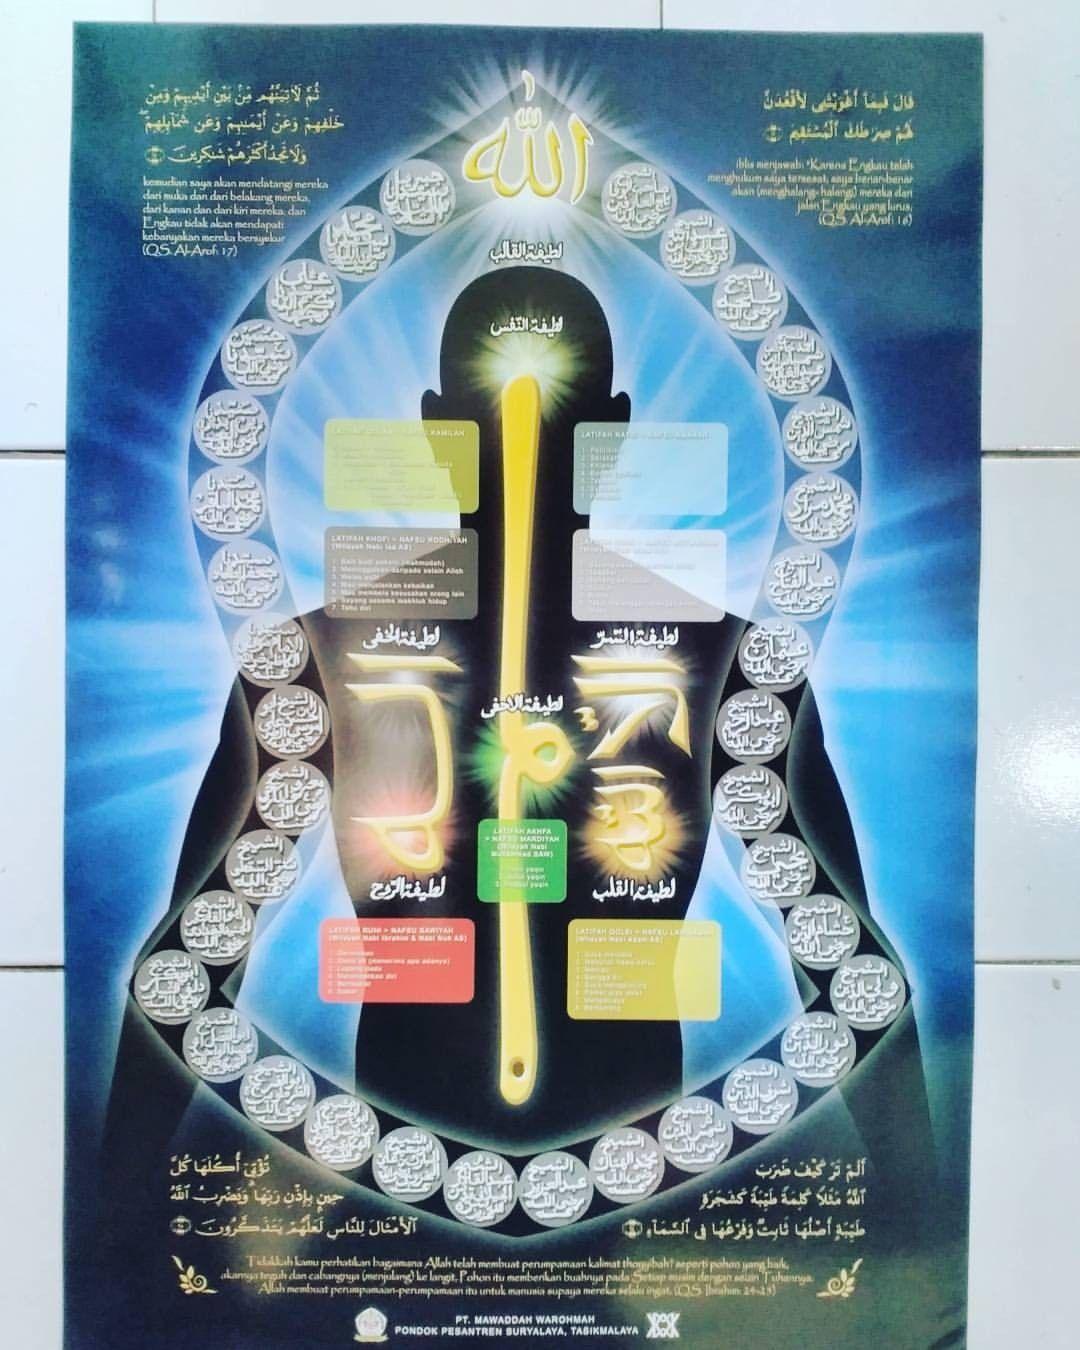 Pin oleh Moch. Al-qibthiy di guru Mursyid